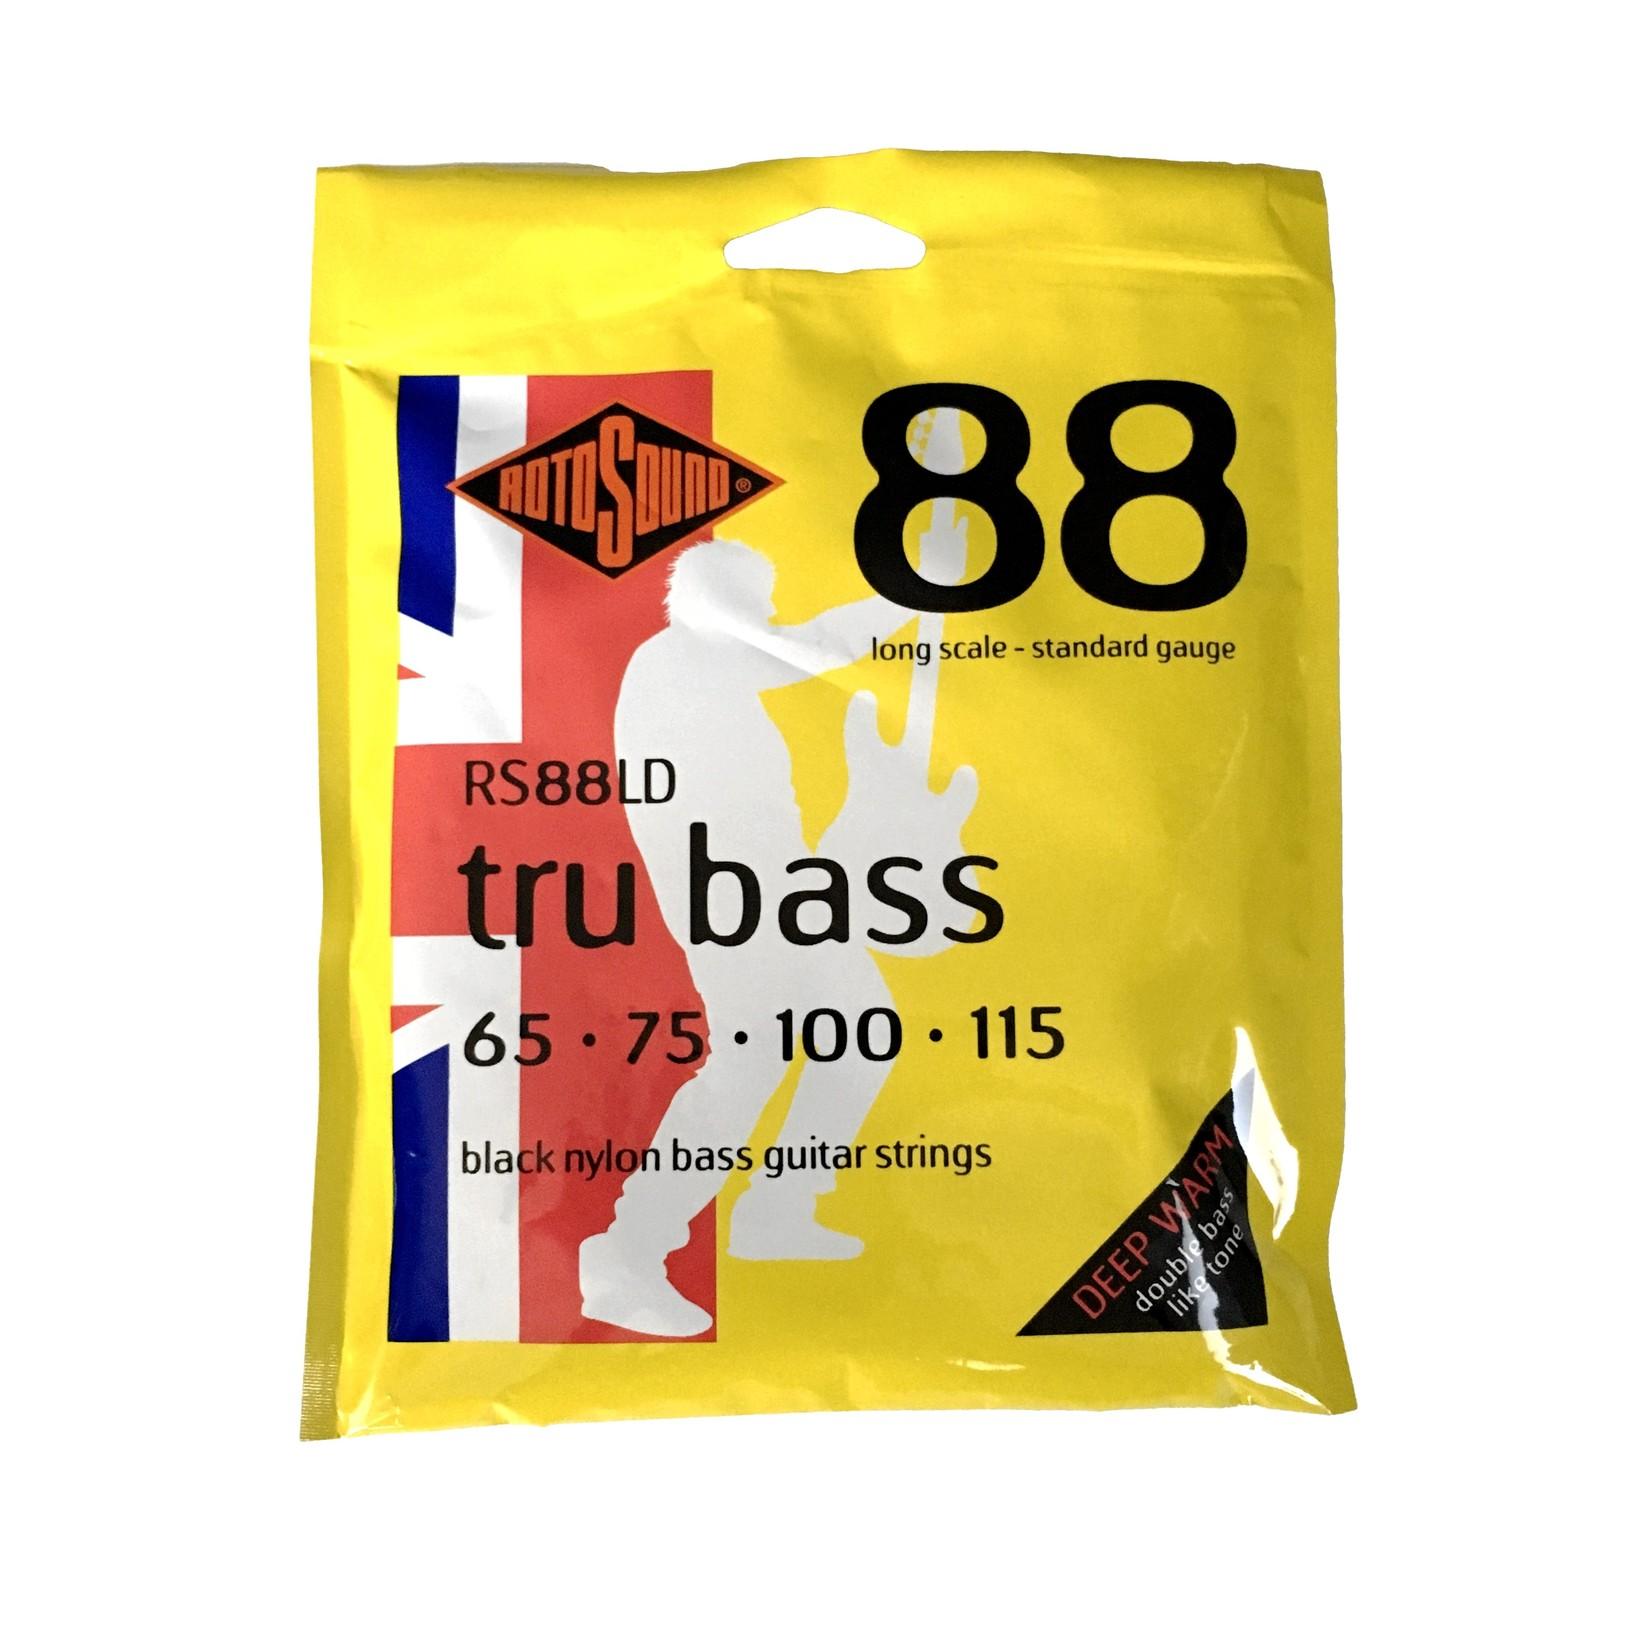 Rotosound Rotosound RS88LD 88 Tru Bass Black Nylon Bass Guitar Strings